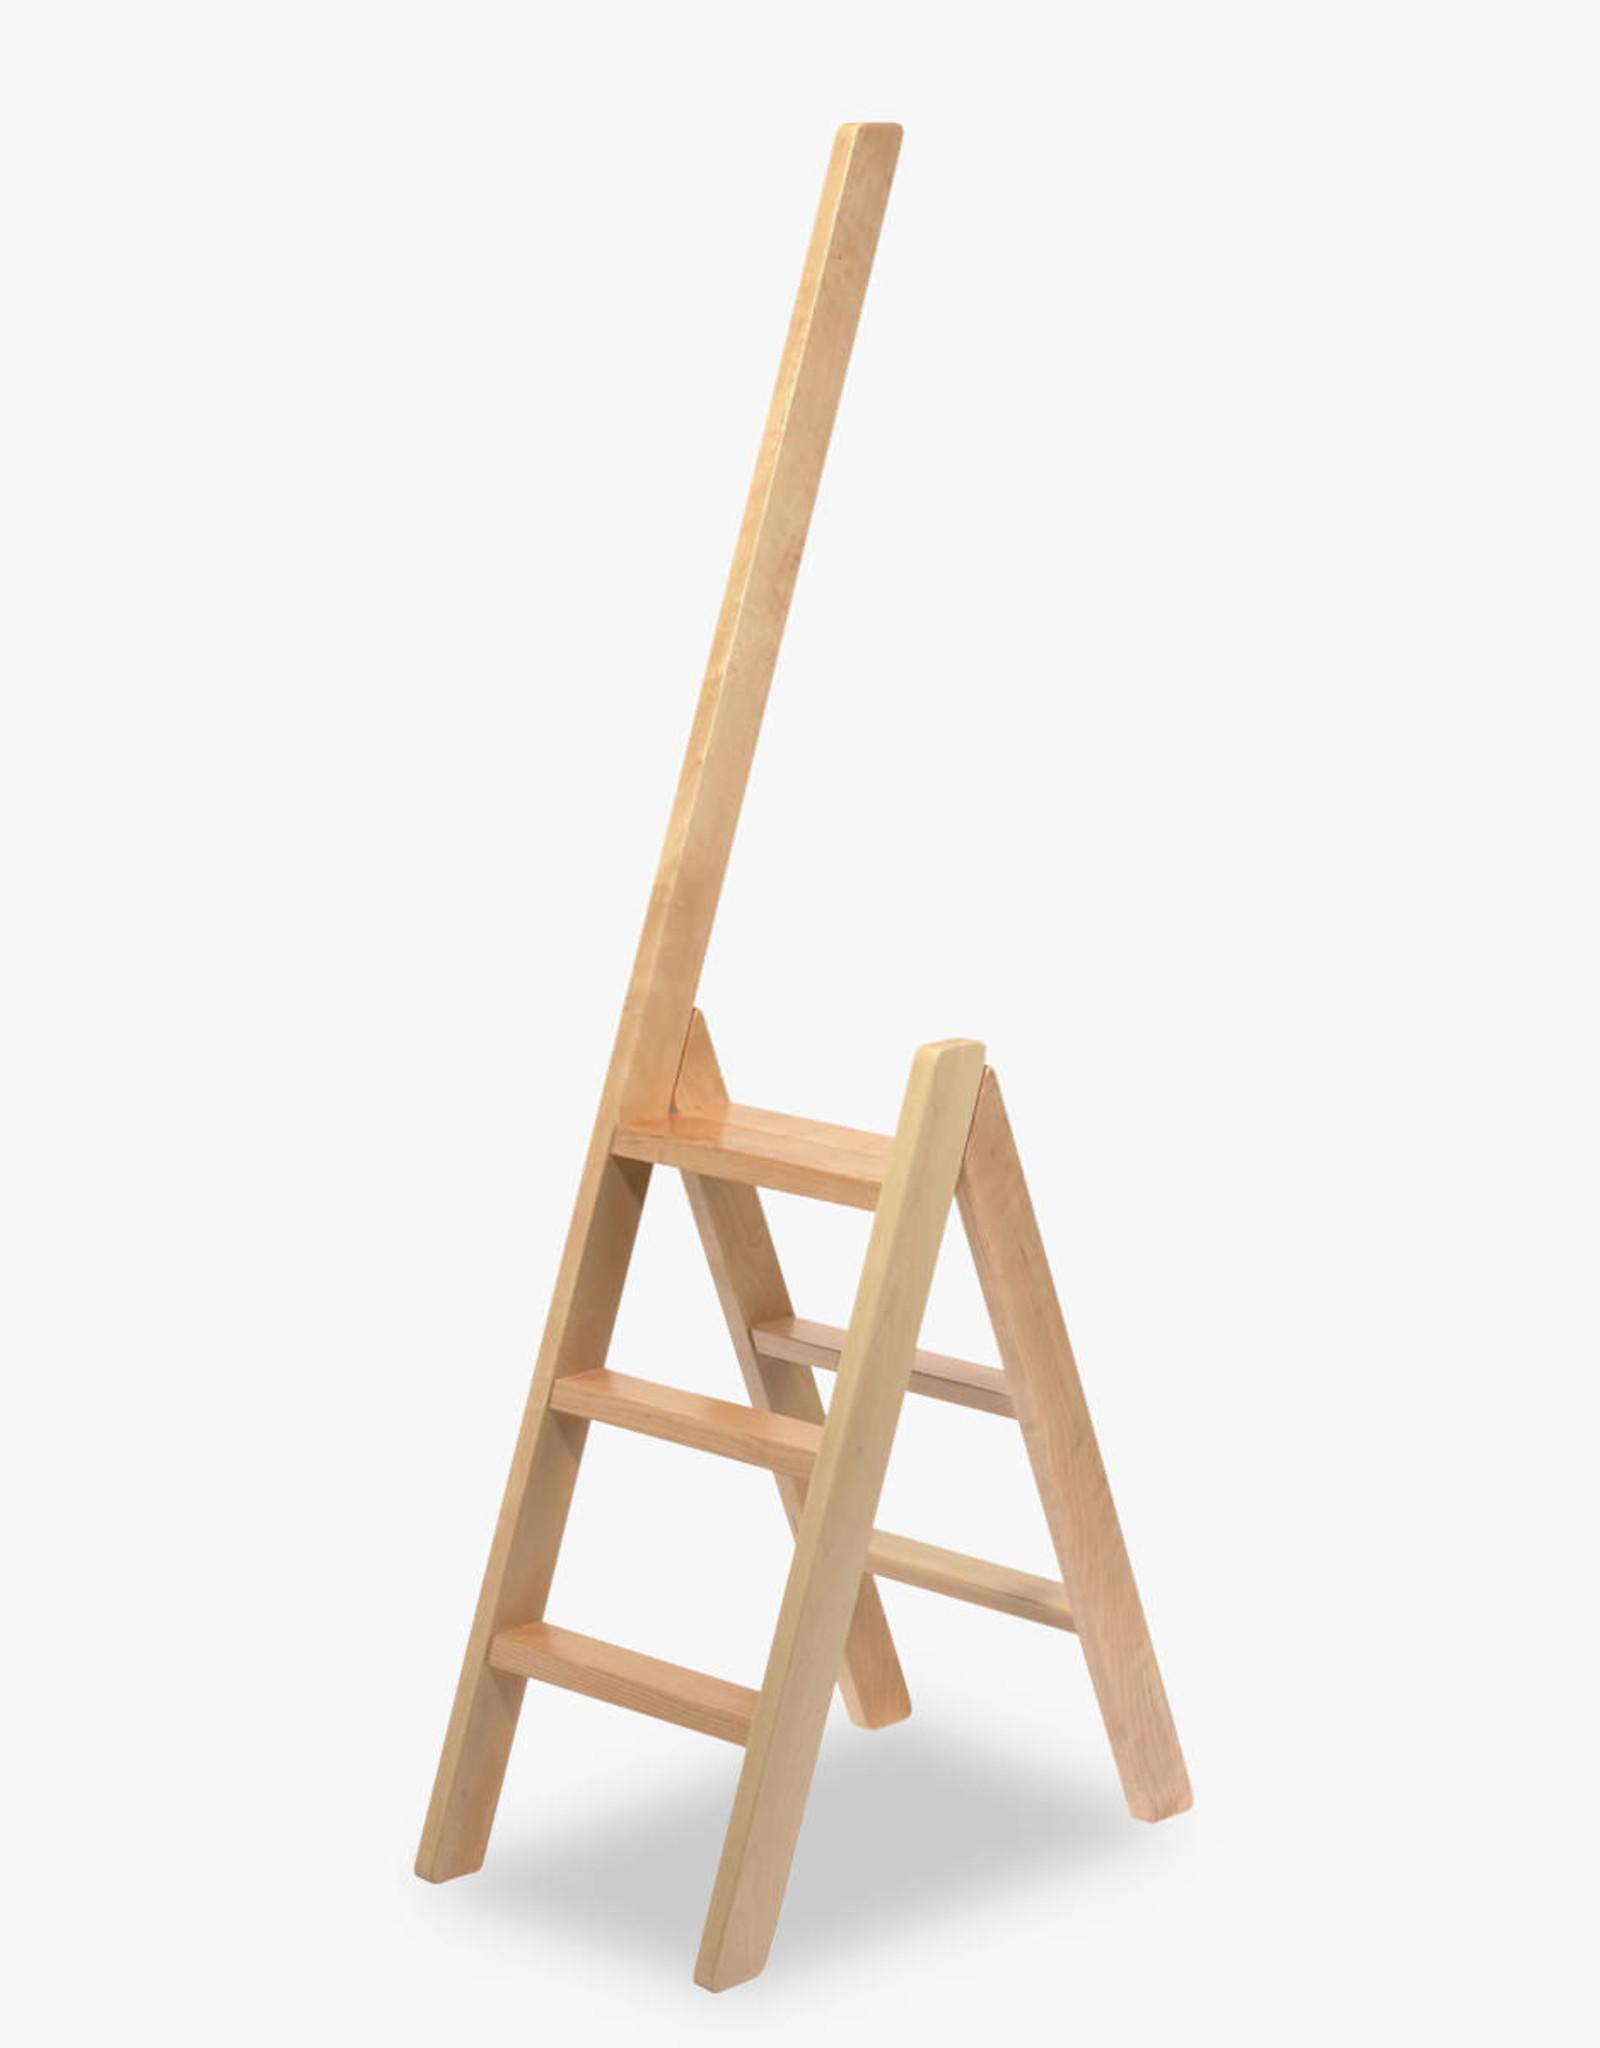 Step Ladder by Benedicte and Poul Erik Find | Natural